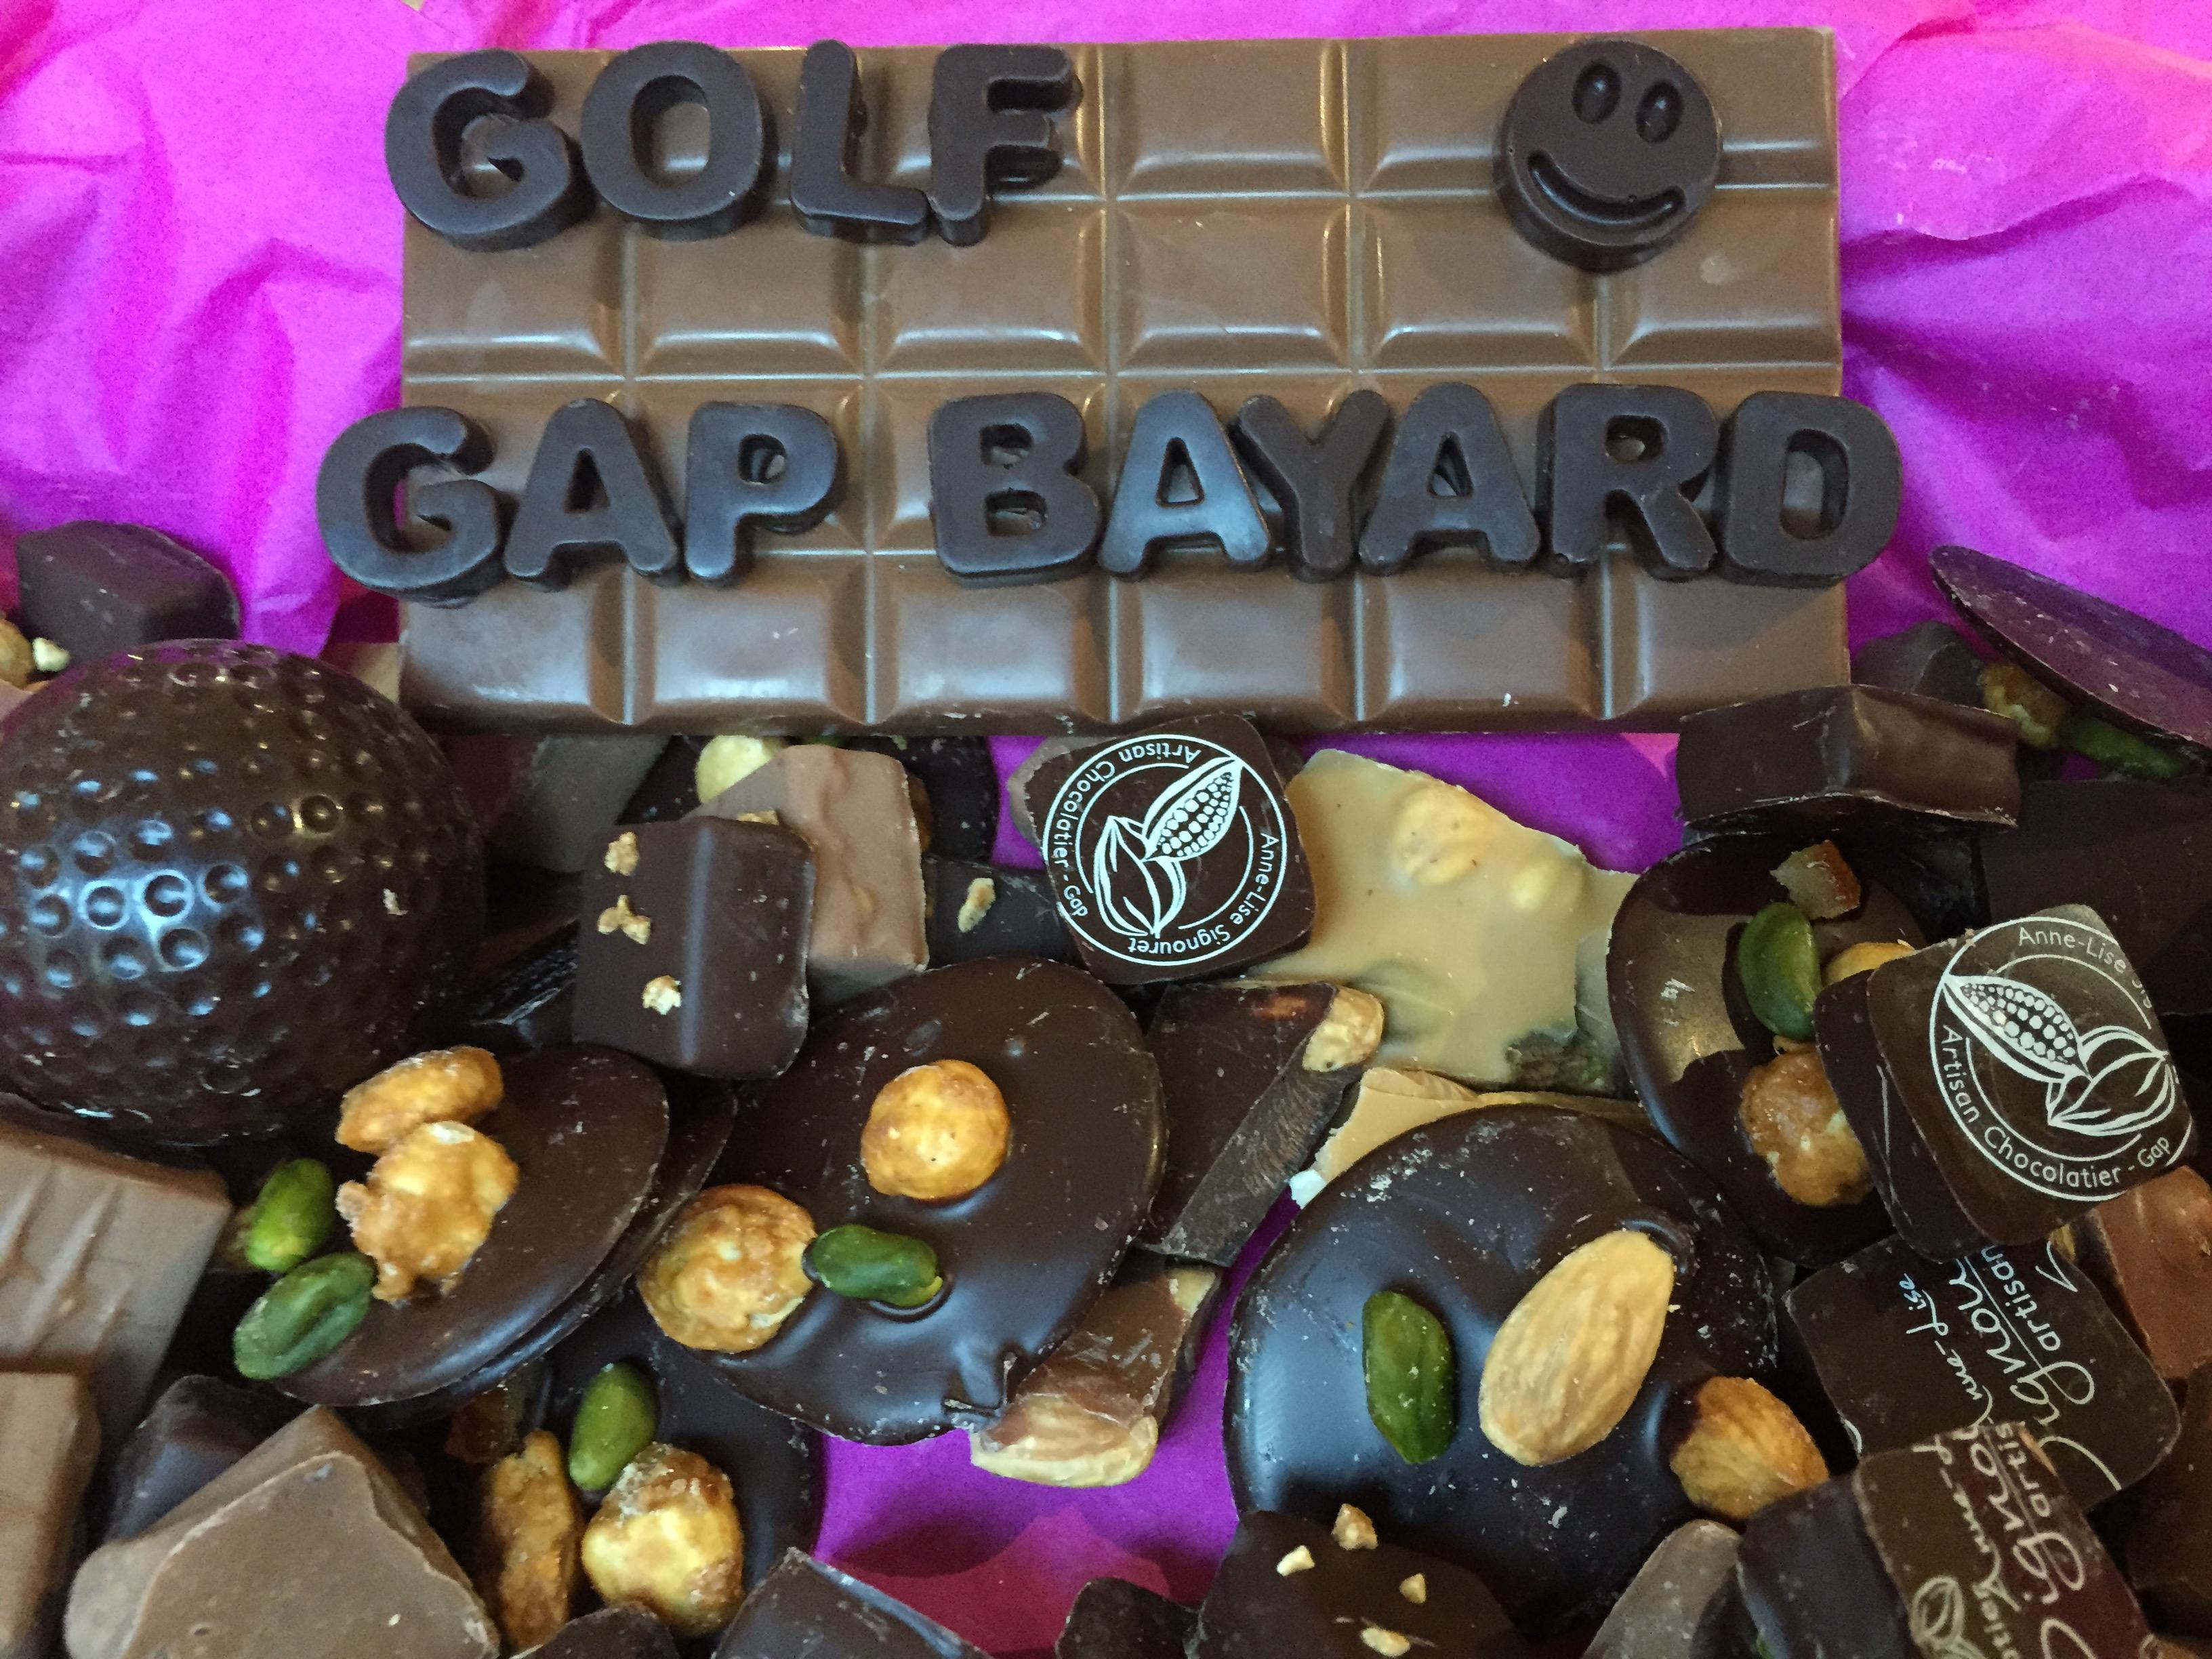 CHOCOLATS SIGNOURET